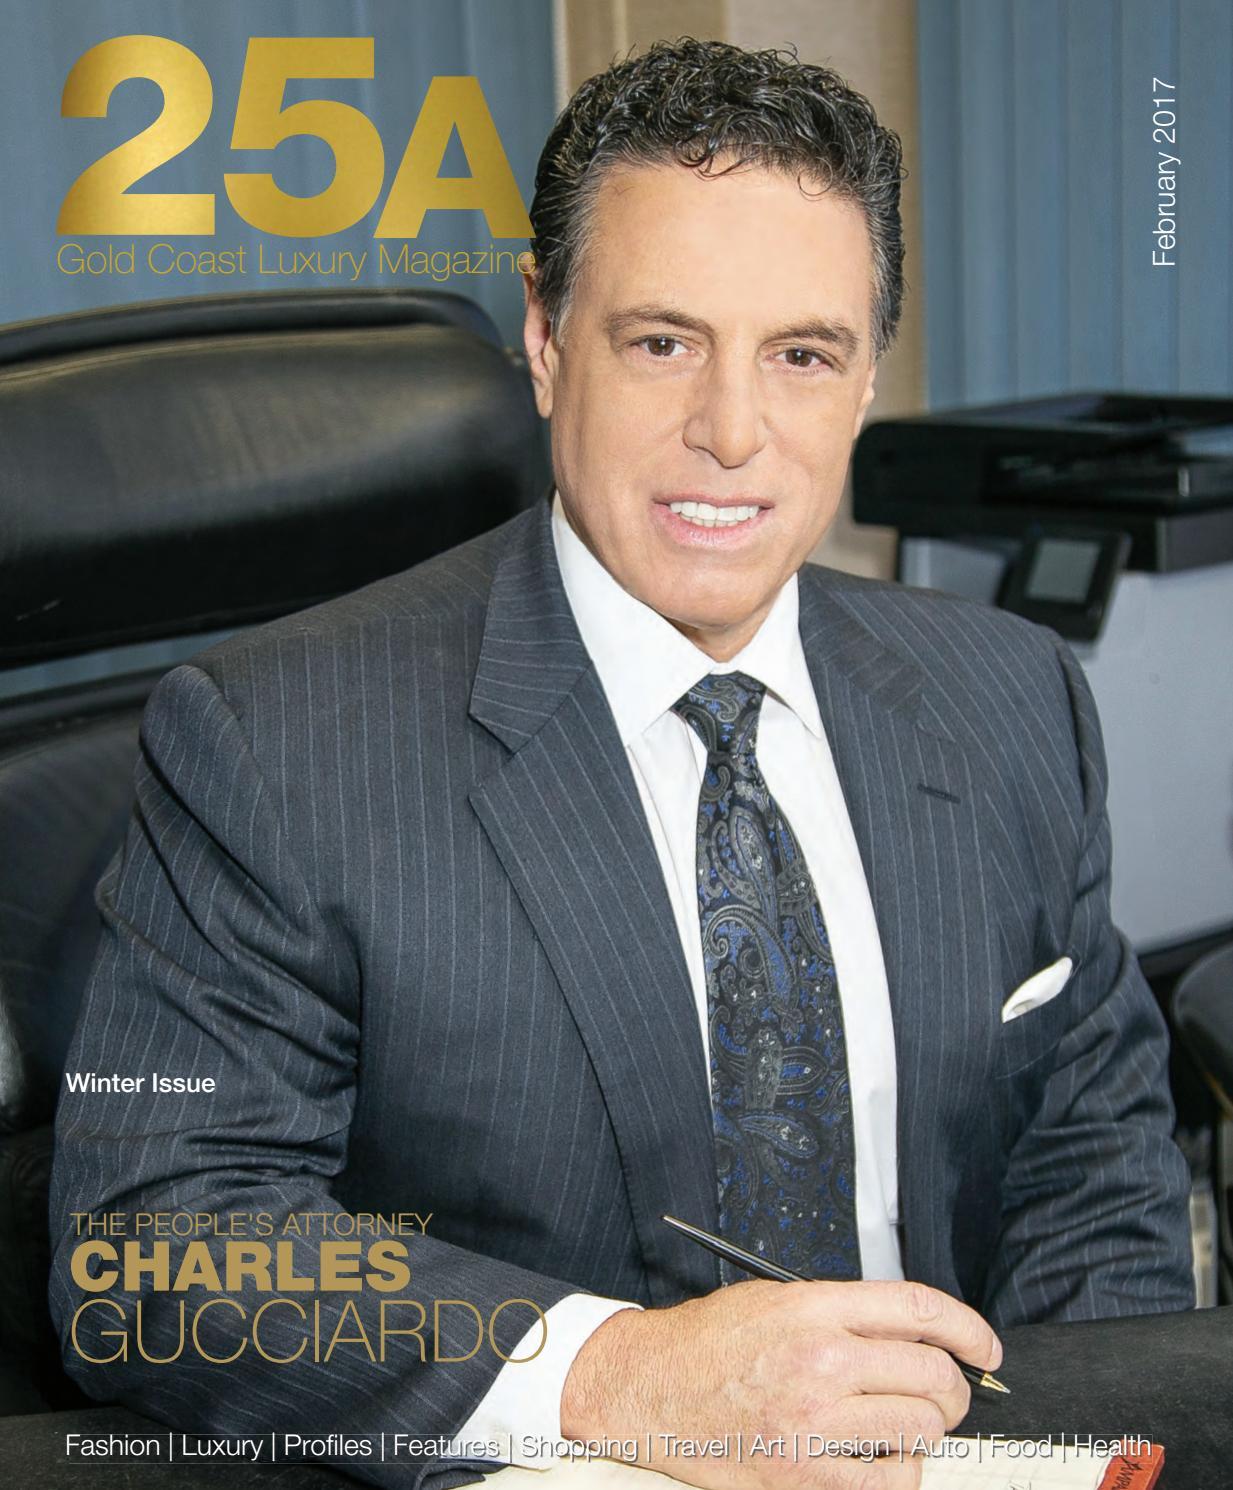 44421cd18a8 25A Magazine by 25A magazine - issuu